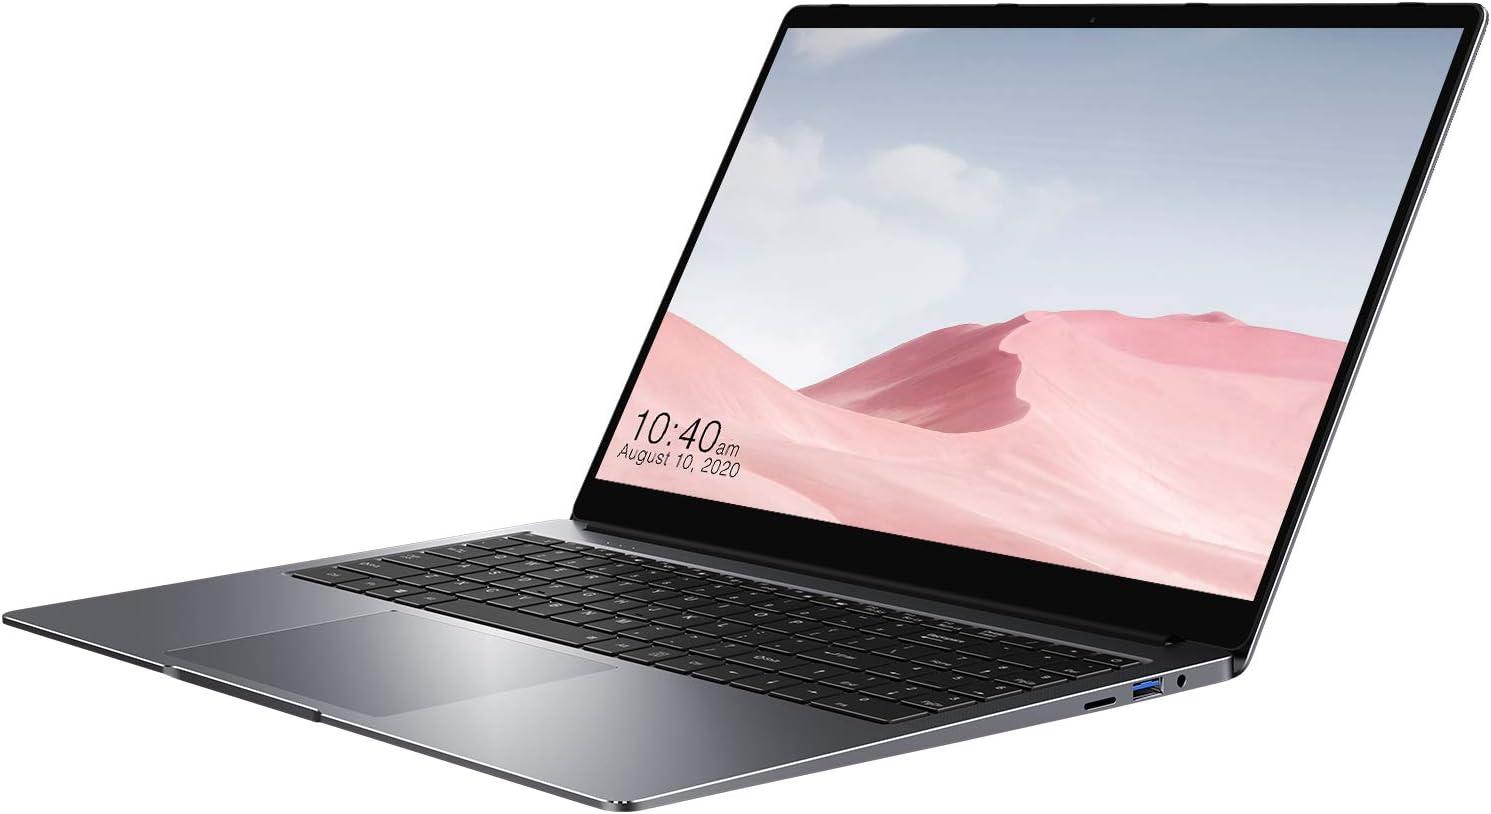 CHUWI HeroBook Plus 15.6 inch Windows 10 Laptop, 1080P Laptop Computer with Intel J4125 and 16GB RAM / 256GB SSD, Support RJ45 Gigabit Ethernet, BT5.1, Dual WiFi